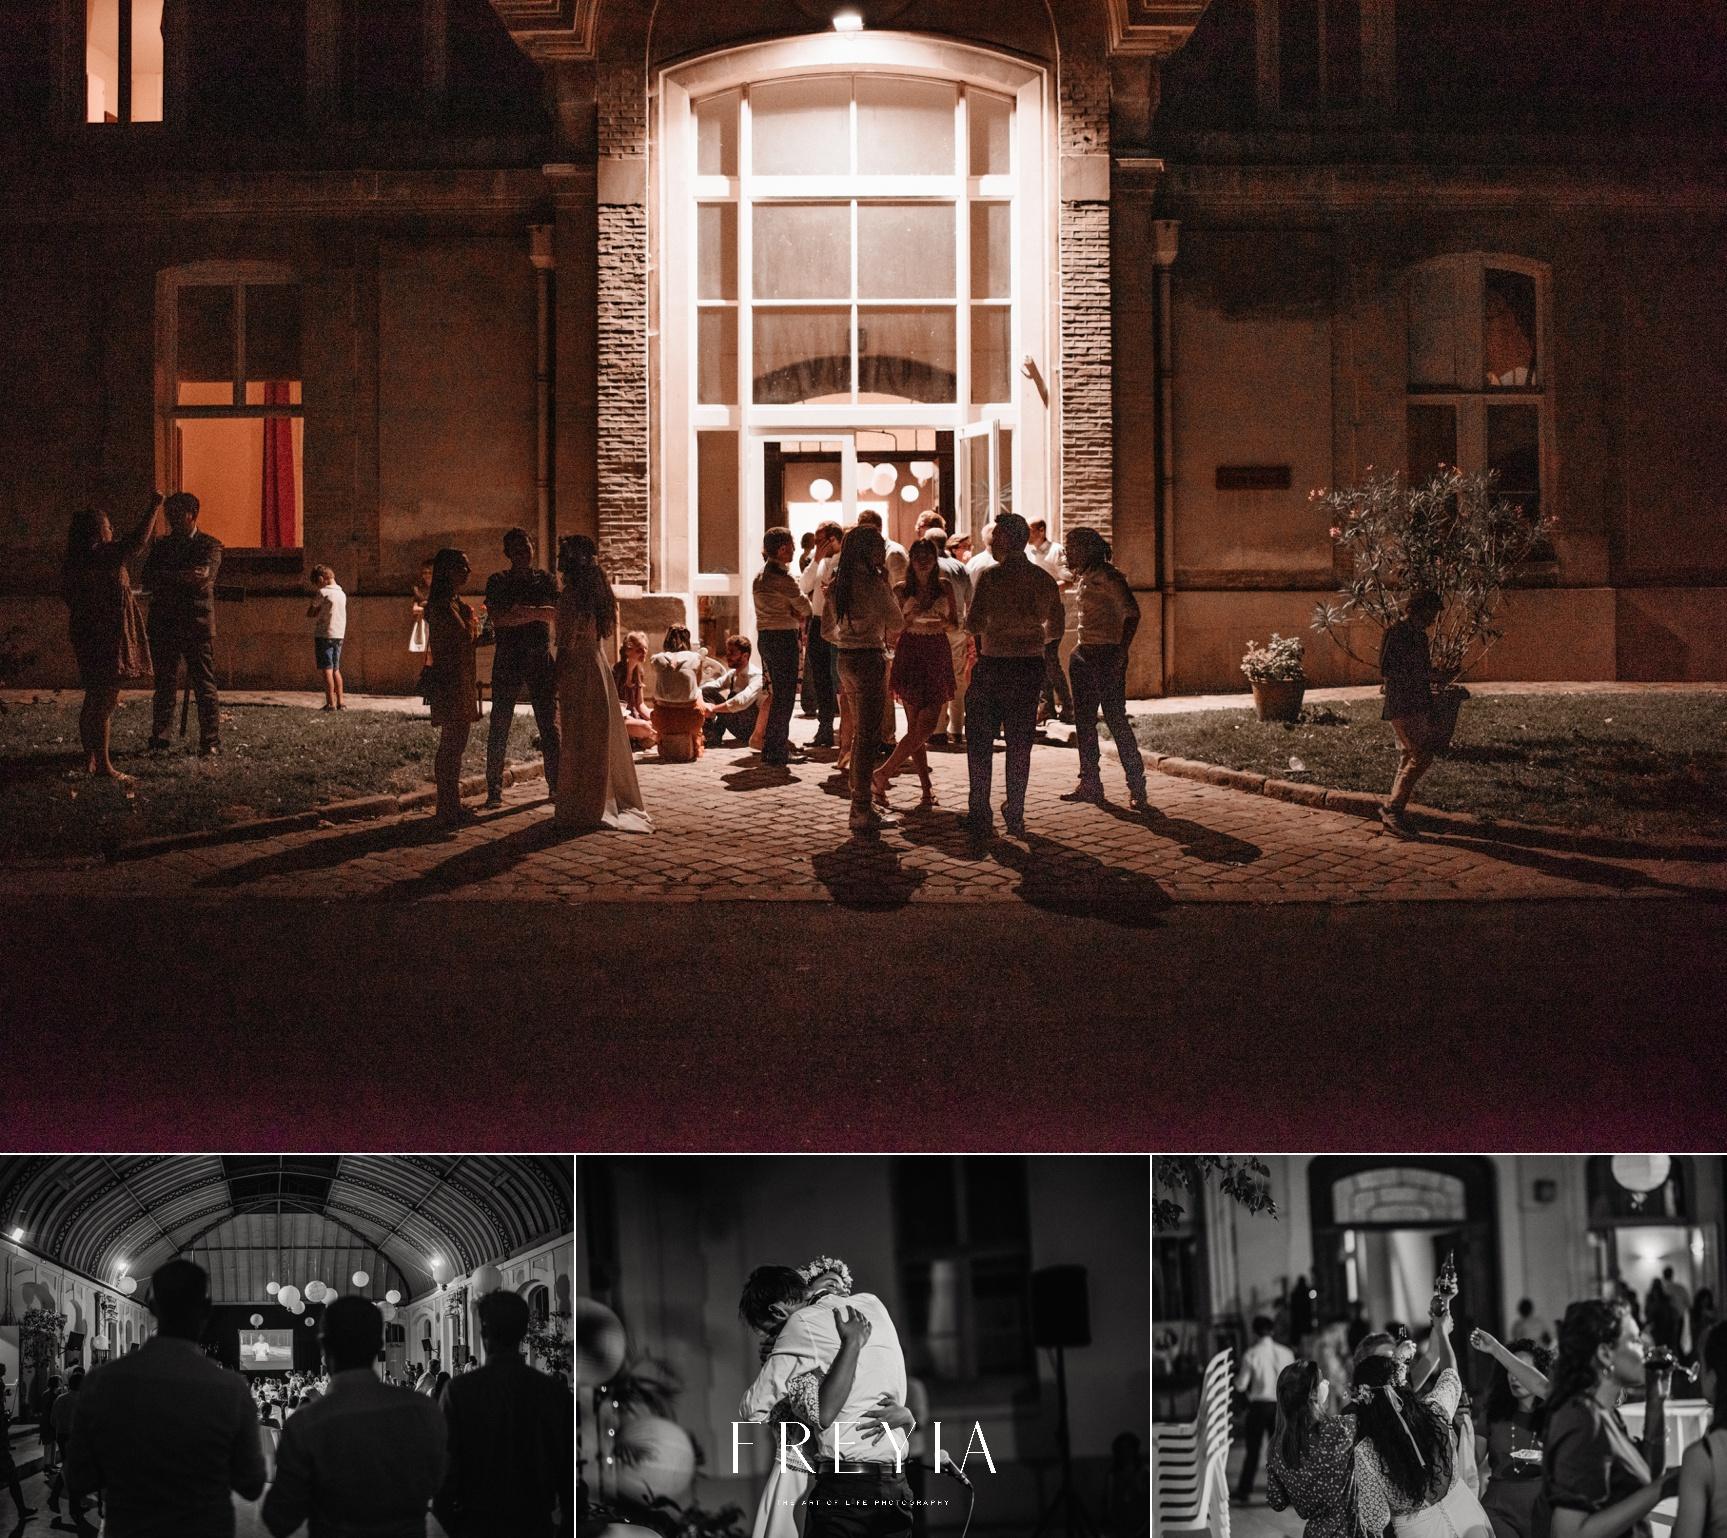 R + T |  mariage reportage alternatif moody intime minimaliste vintage naturel boho boheme |  PHOTOGRAPHE mariage PARIS france destination  | FREYIA photography_-364.jpg